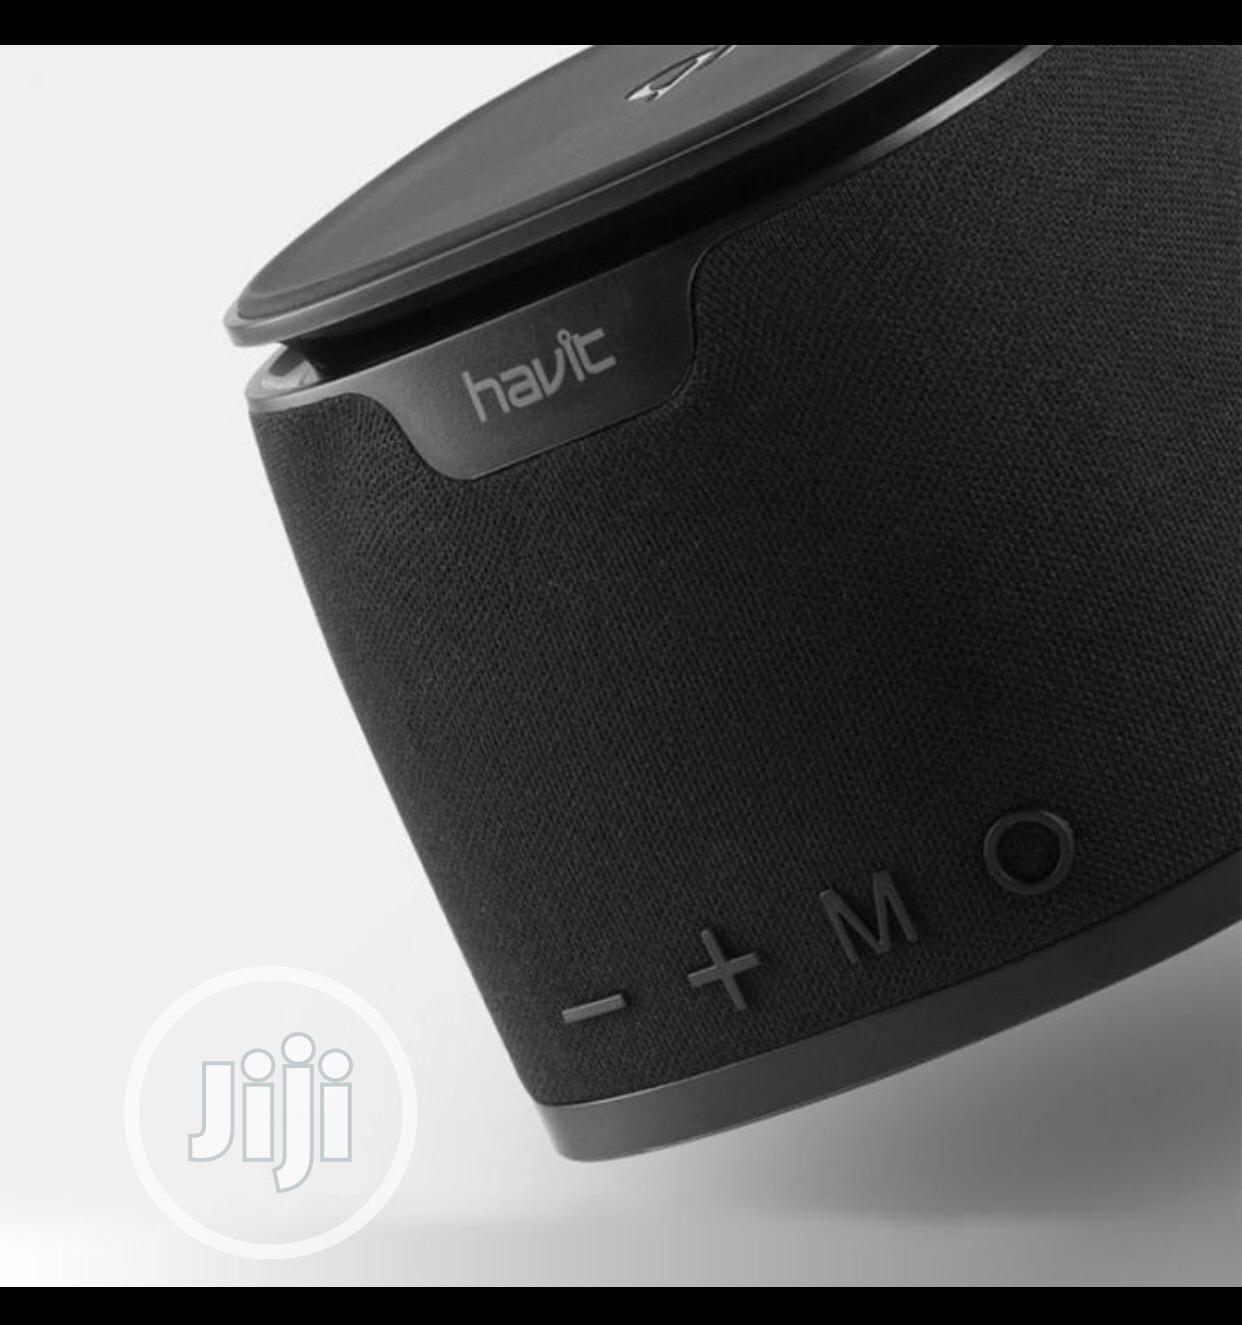 HAVIT M1 Bluetooth Speaker Qi Wireless Charger Mini Heavy Bass Stereo | Audio & Music Equipment for sale in Ikeja, Lagos State, Nigeria